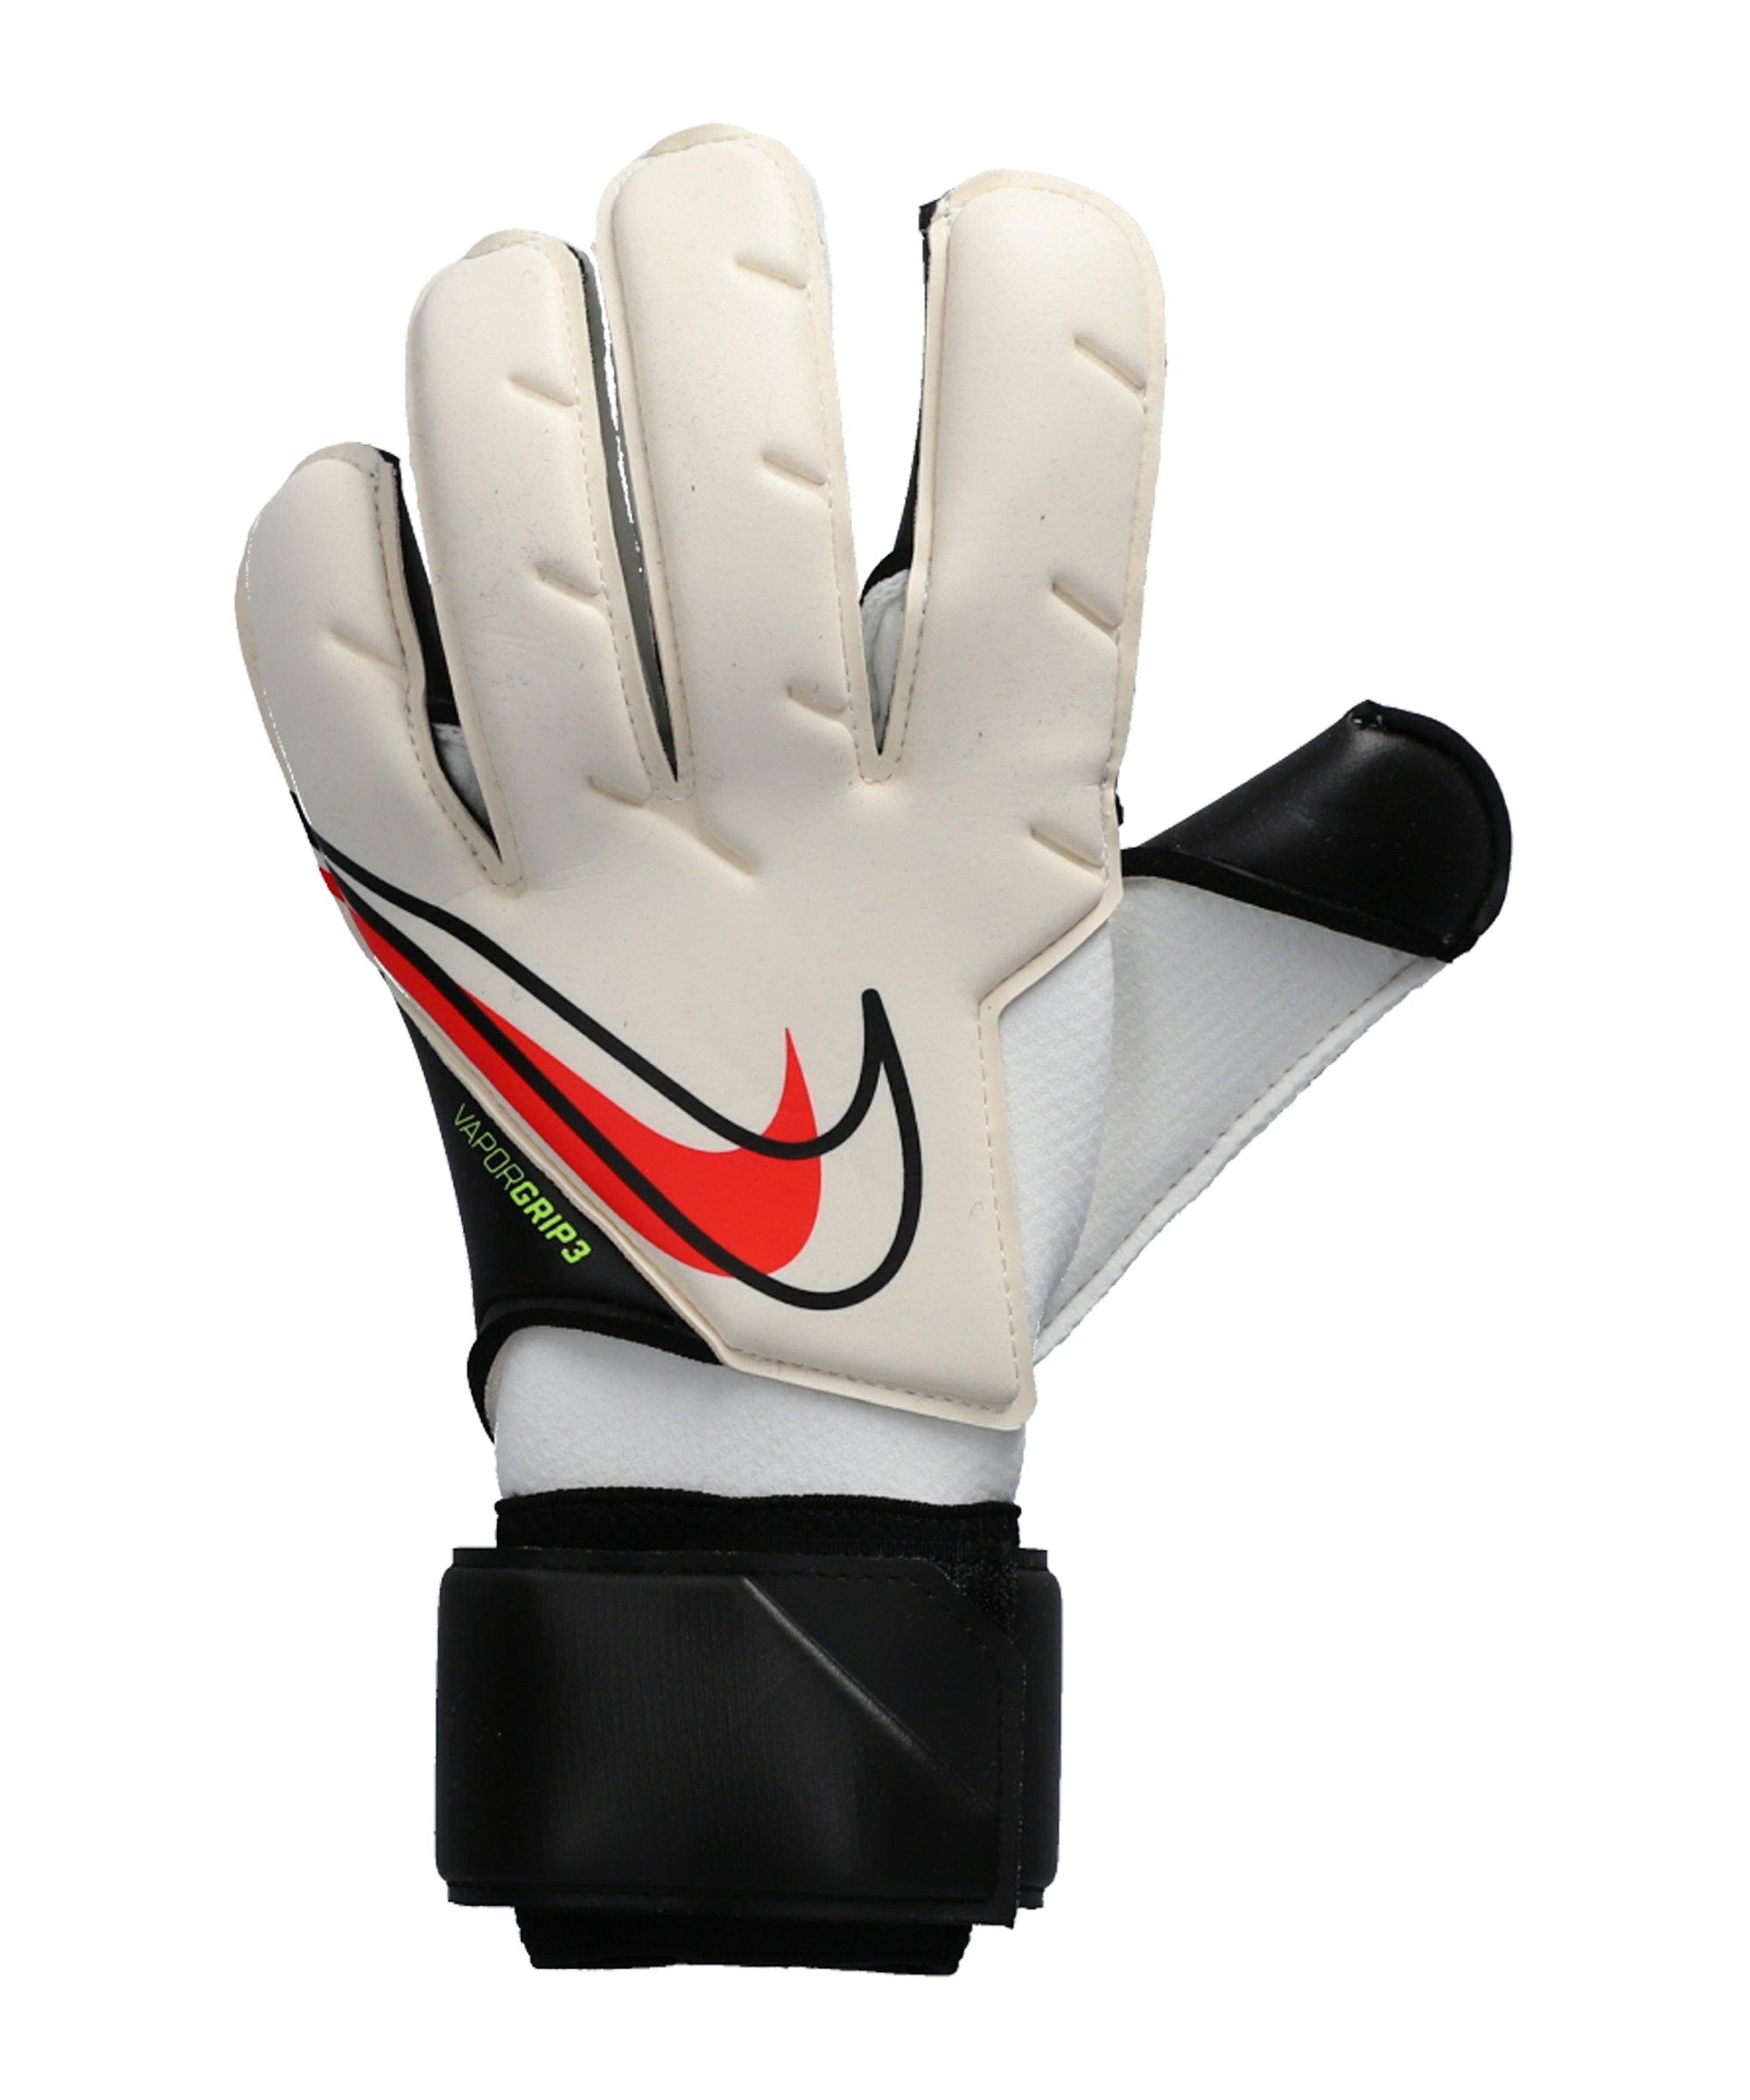 Nike VG3 Promo TW-Handschuhe Weiss Schwarz Rot F100 - weiss